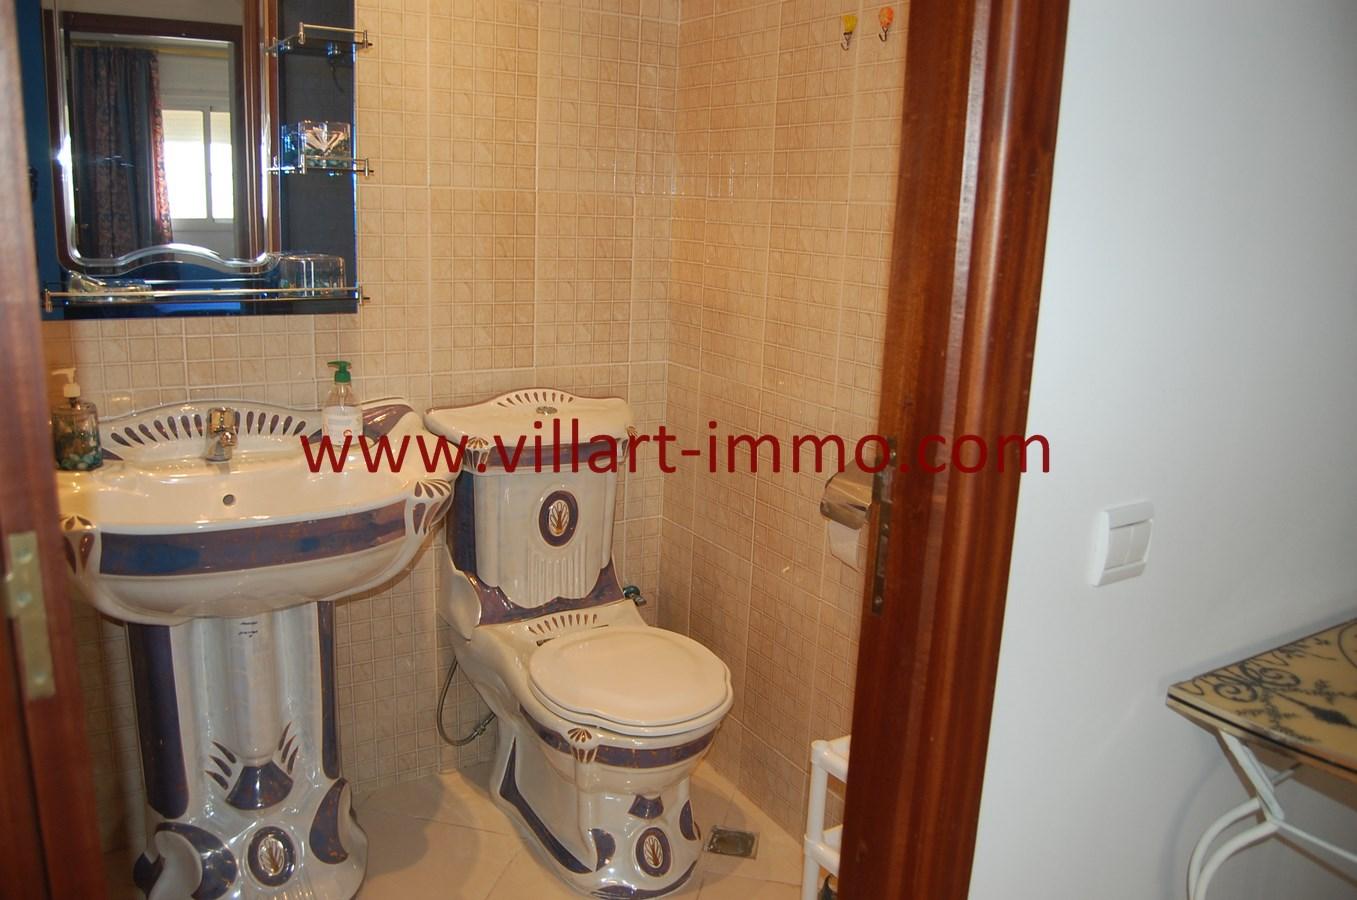 13-Vente-Appartement-Tanger-Route de Rabat-Toilette-VA494-Villart Immo